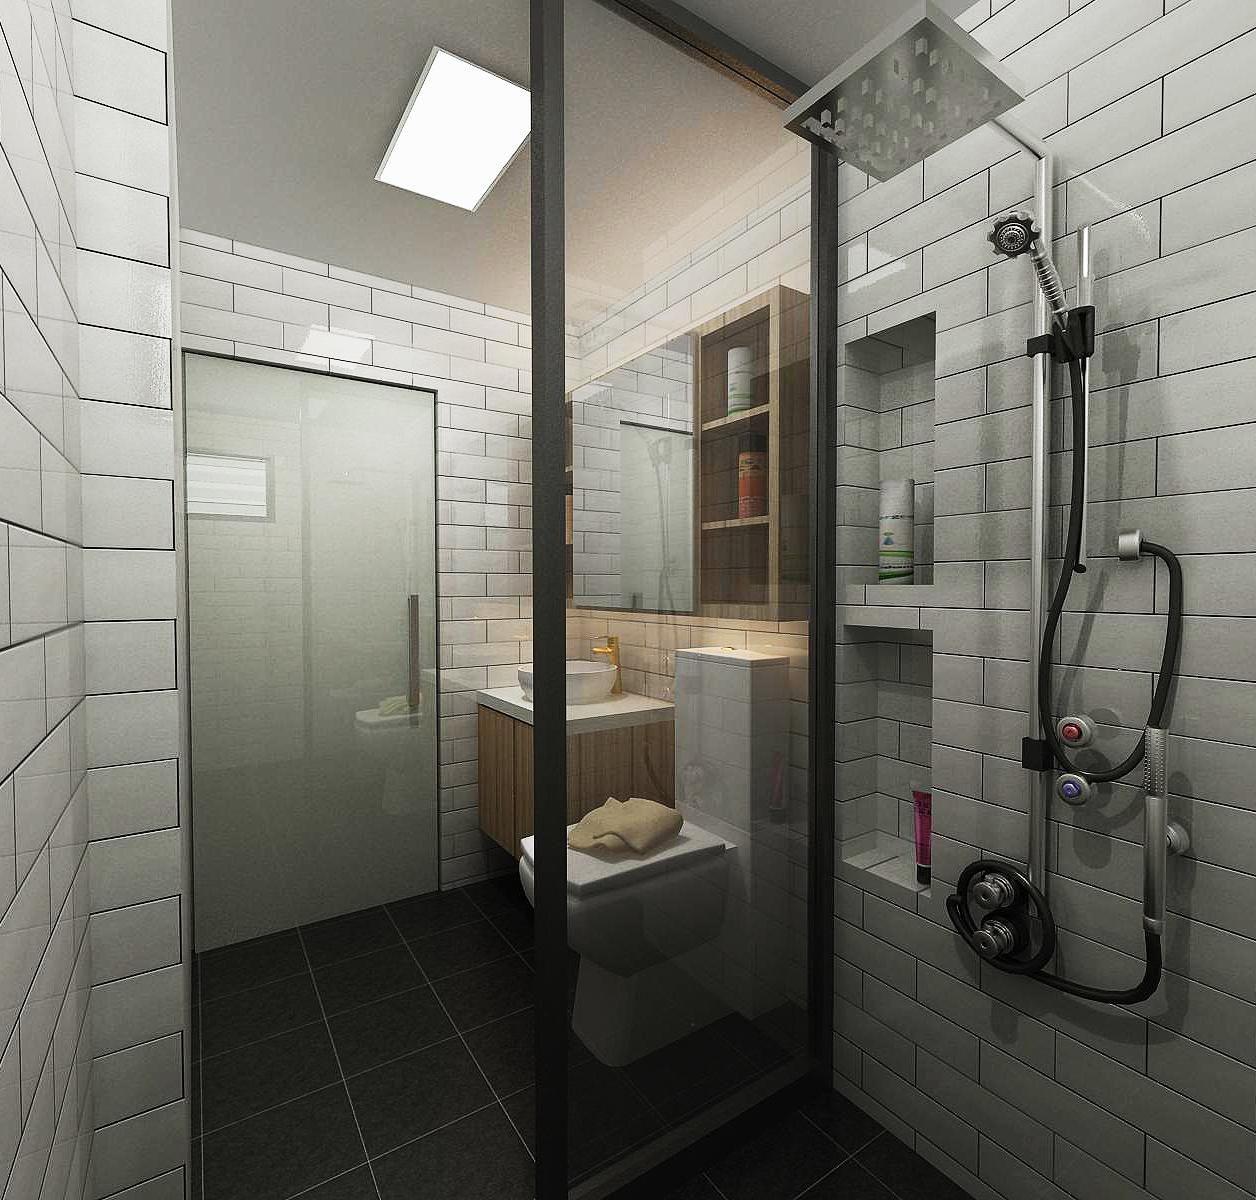 A Scandustrial Concept Sengkang Ea Reno T Blog Chat Resort Bathroom Home Deco Inspired Homes Famous concept bathroom ideas